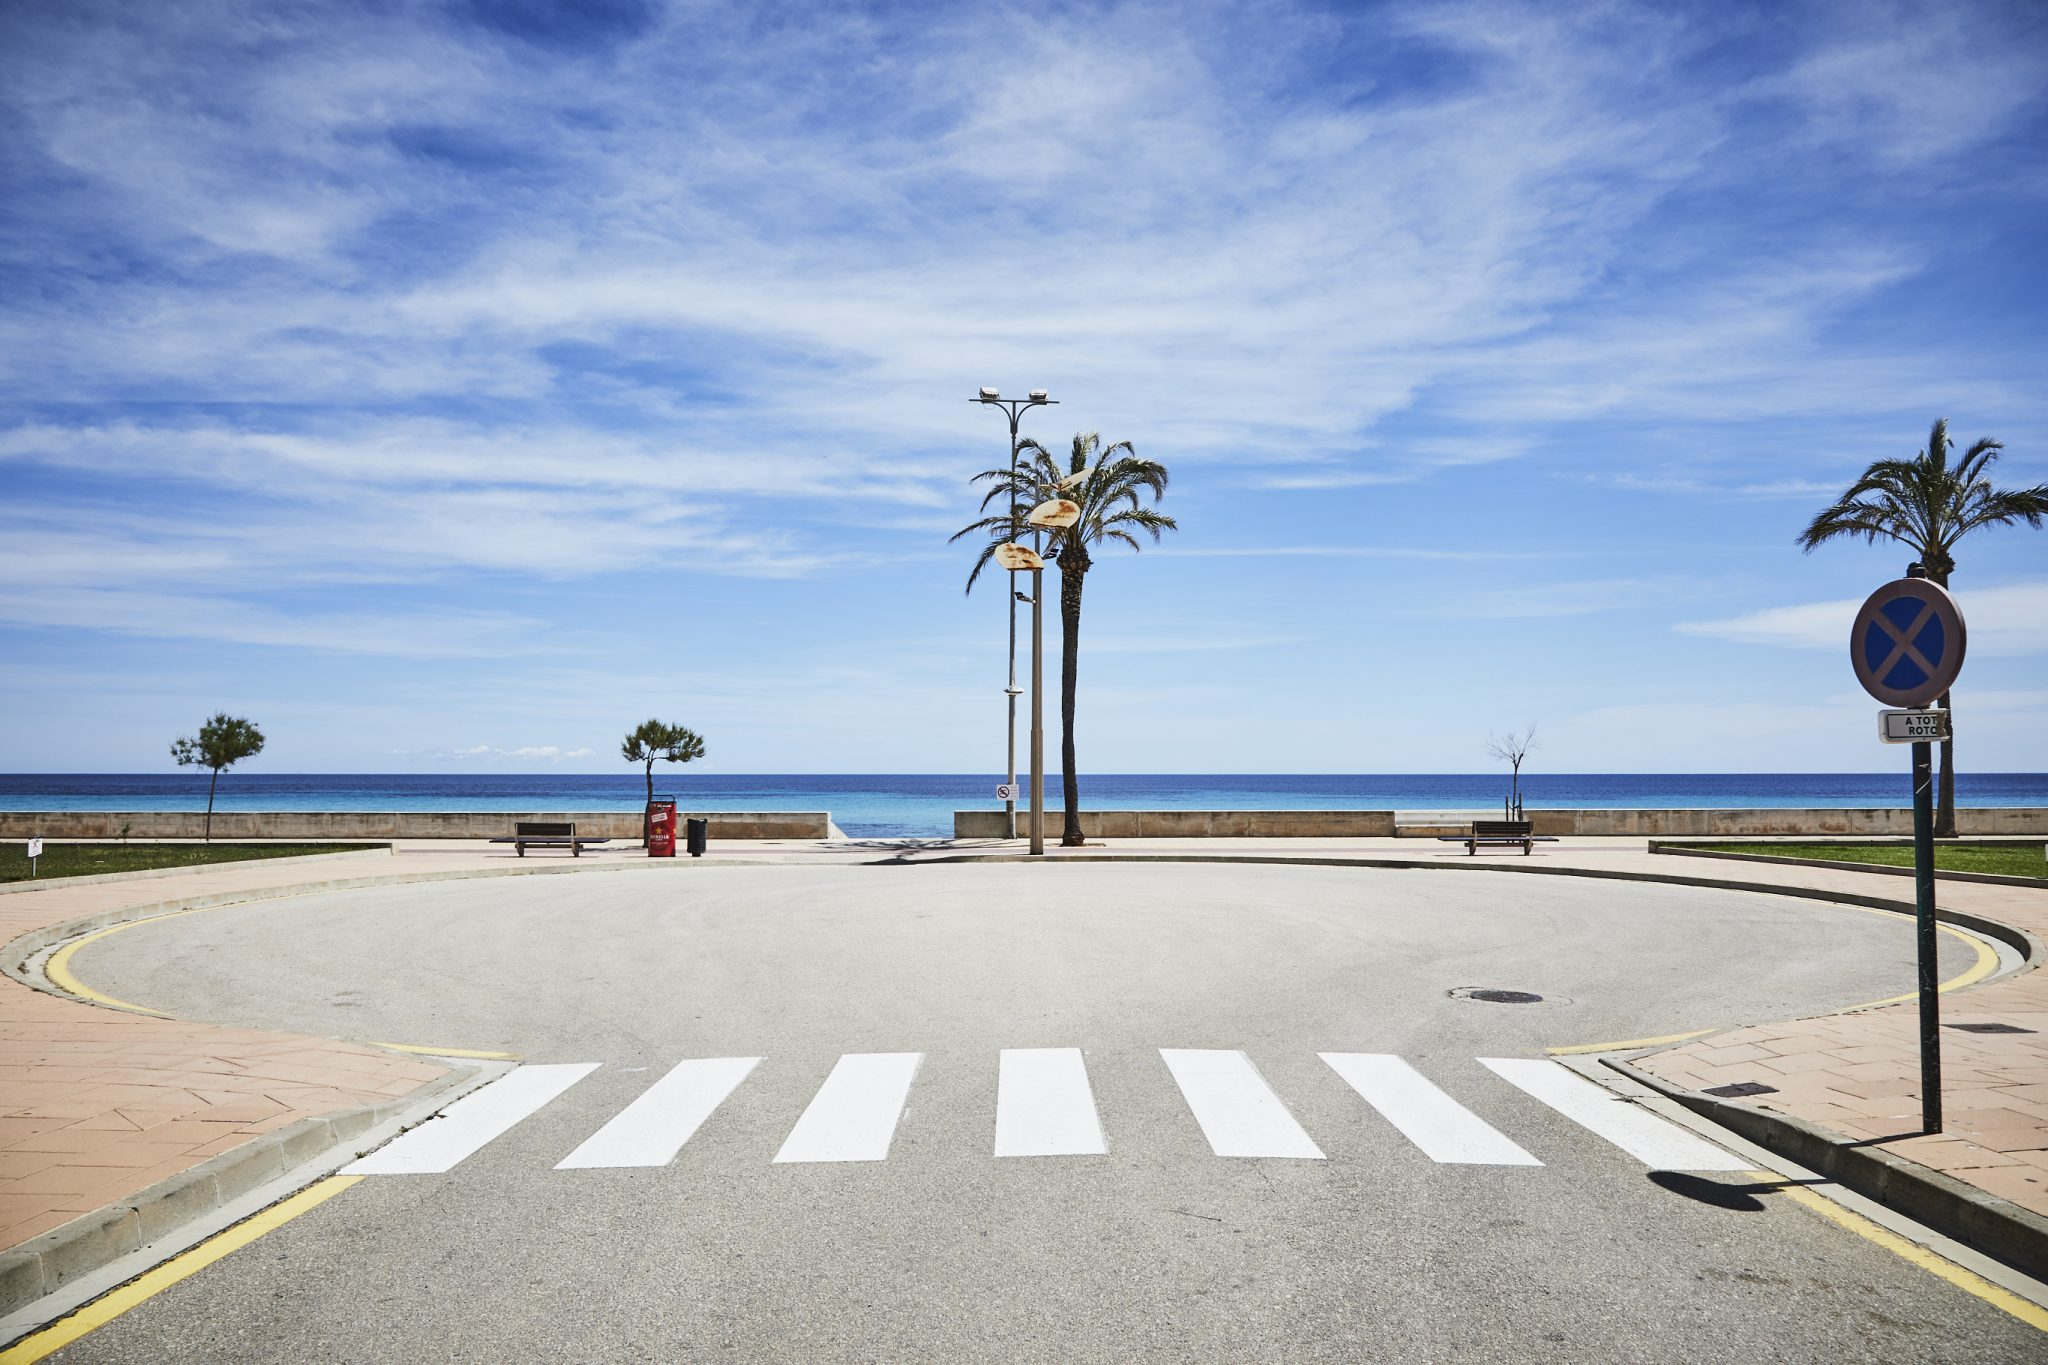 12_RifSpahni_Mallorca Covid_20_A2A0759